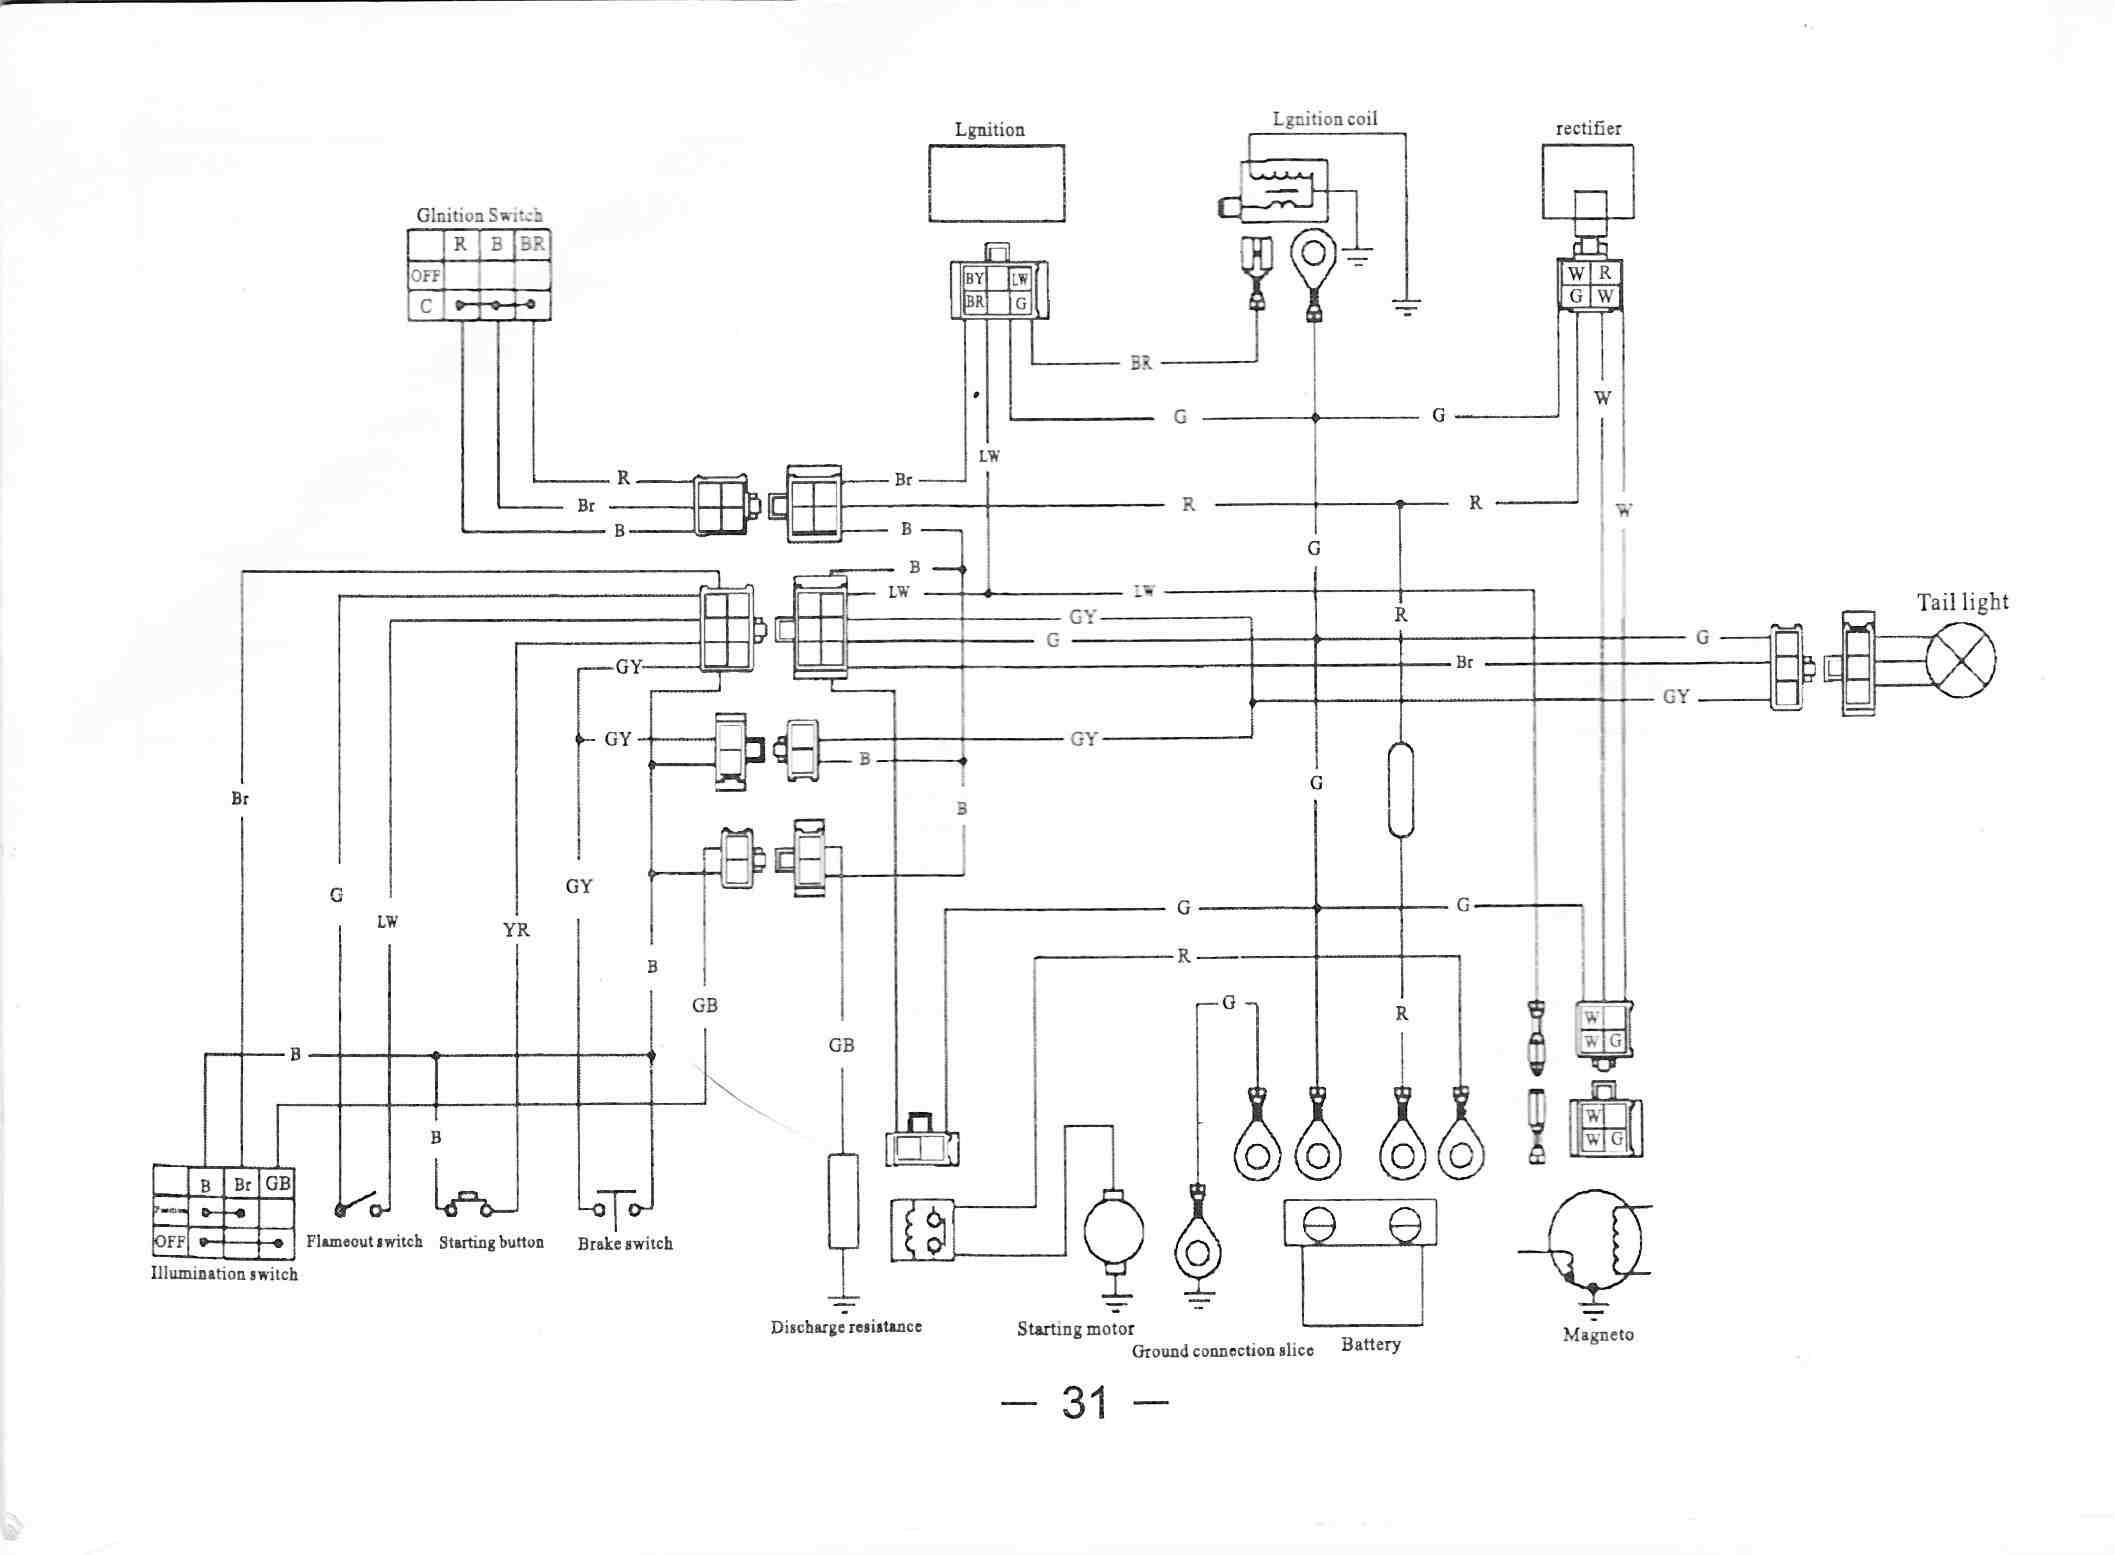 Unusual 87 yamaha moto 4 350 wiring blueprint images wiring awesome yamaha aerox wiring diagram images everything you need to asfbconference2016 Images